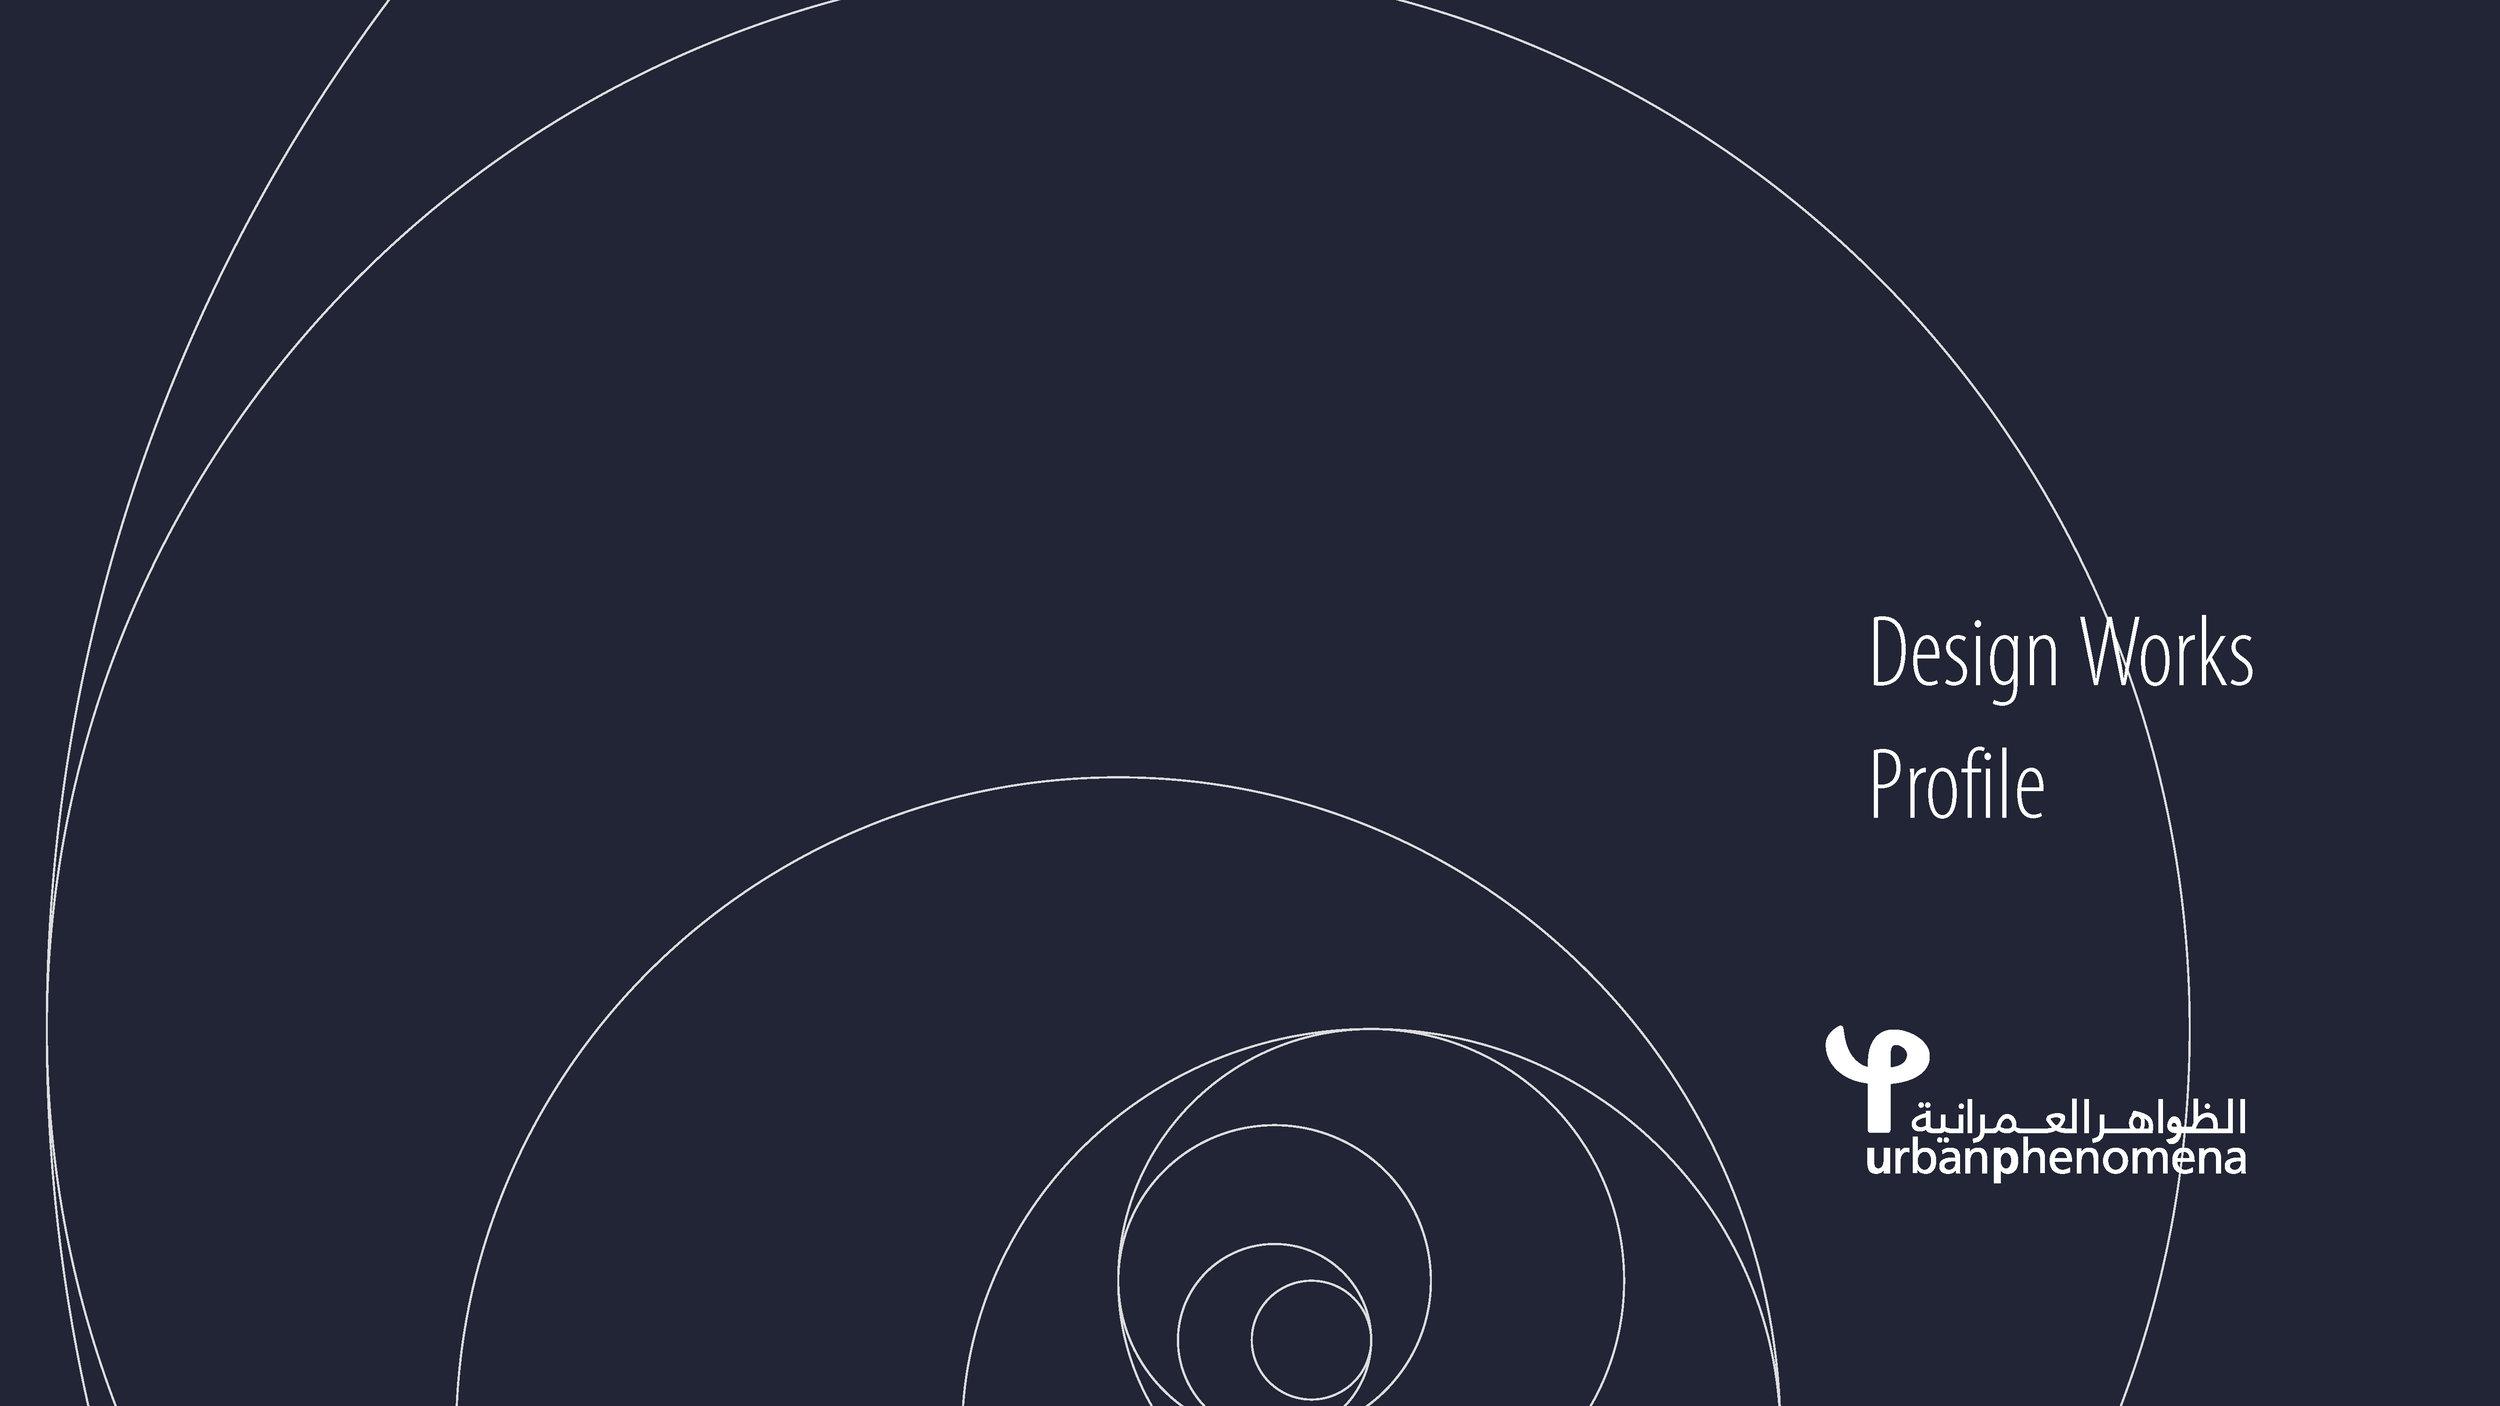 urbanphenomena design services (18MB pdf)